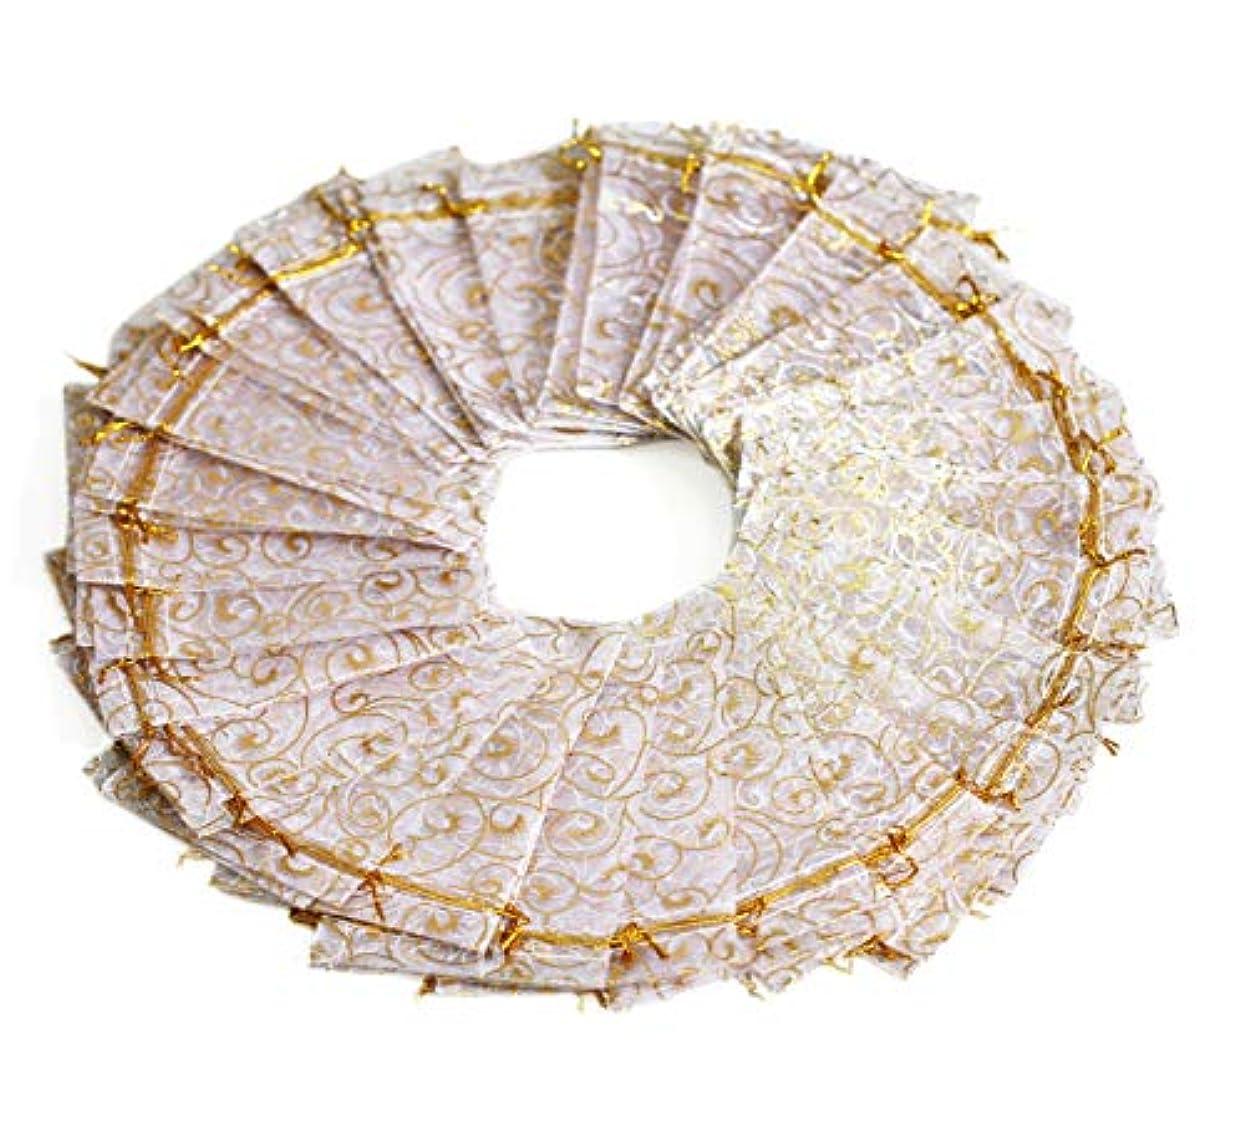 EDENKISS Drawstring Organza Jewelry Pouch Bags Eyelash Gold 5X7 (White)